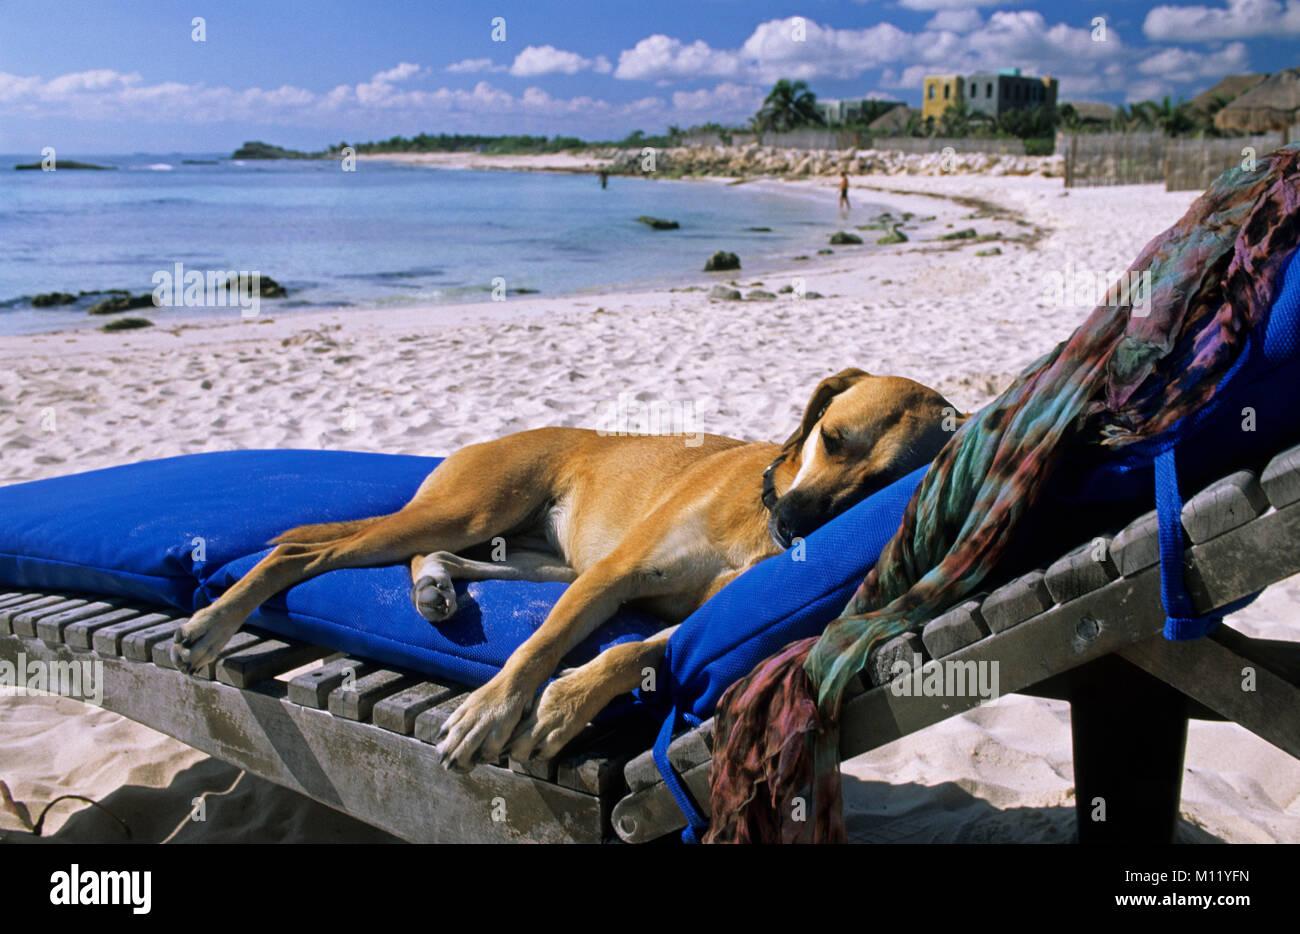 mexiko halbinsel yucatan tulum hund auf dem liegestuhl hund auf dem liegestuhl am strand. Black Bedroom Furniture Sets. Home Design Ideas